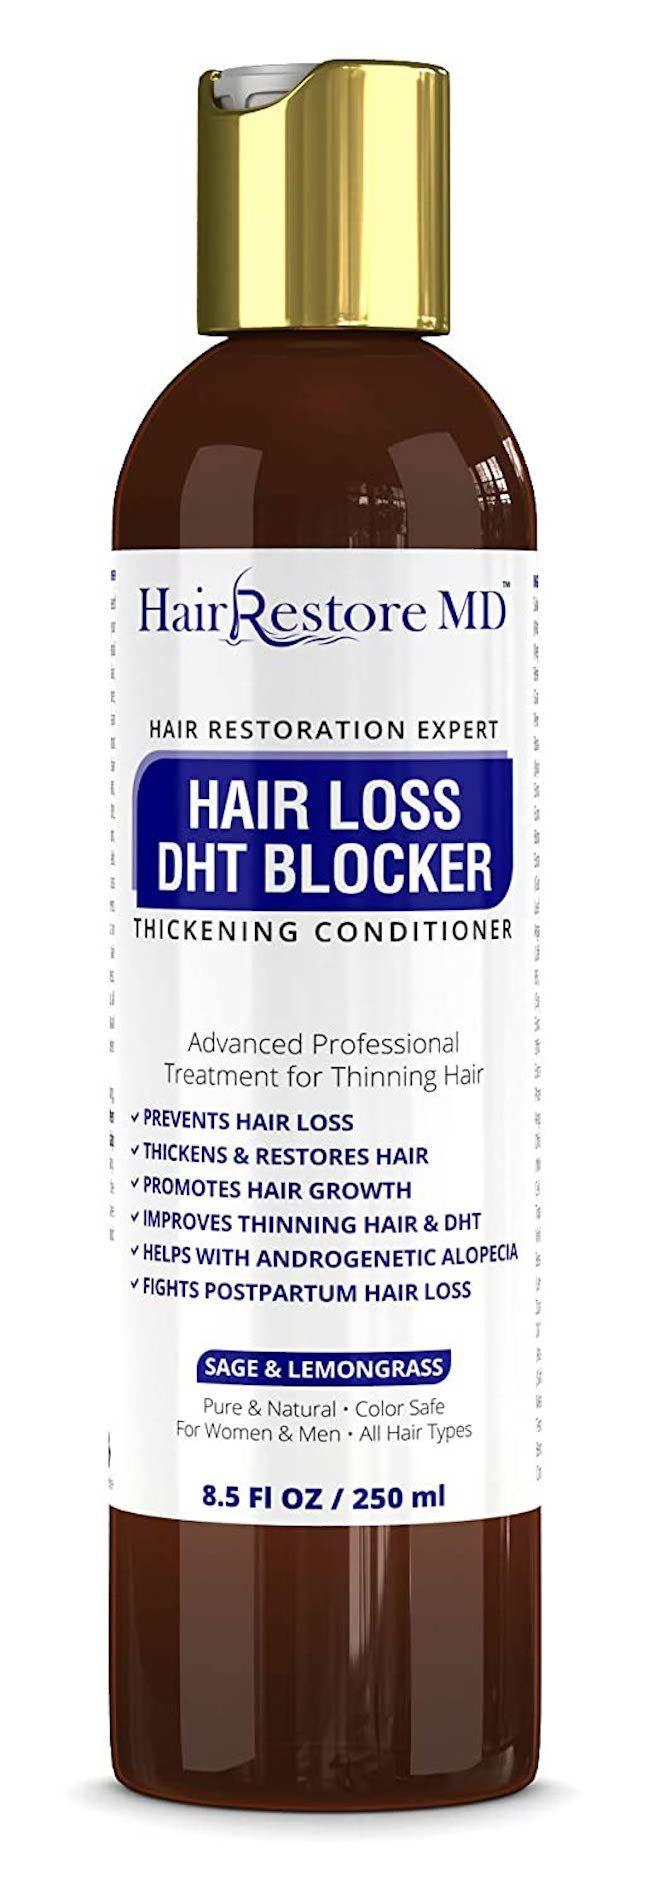 Hair Restore